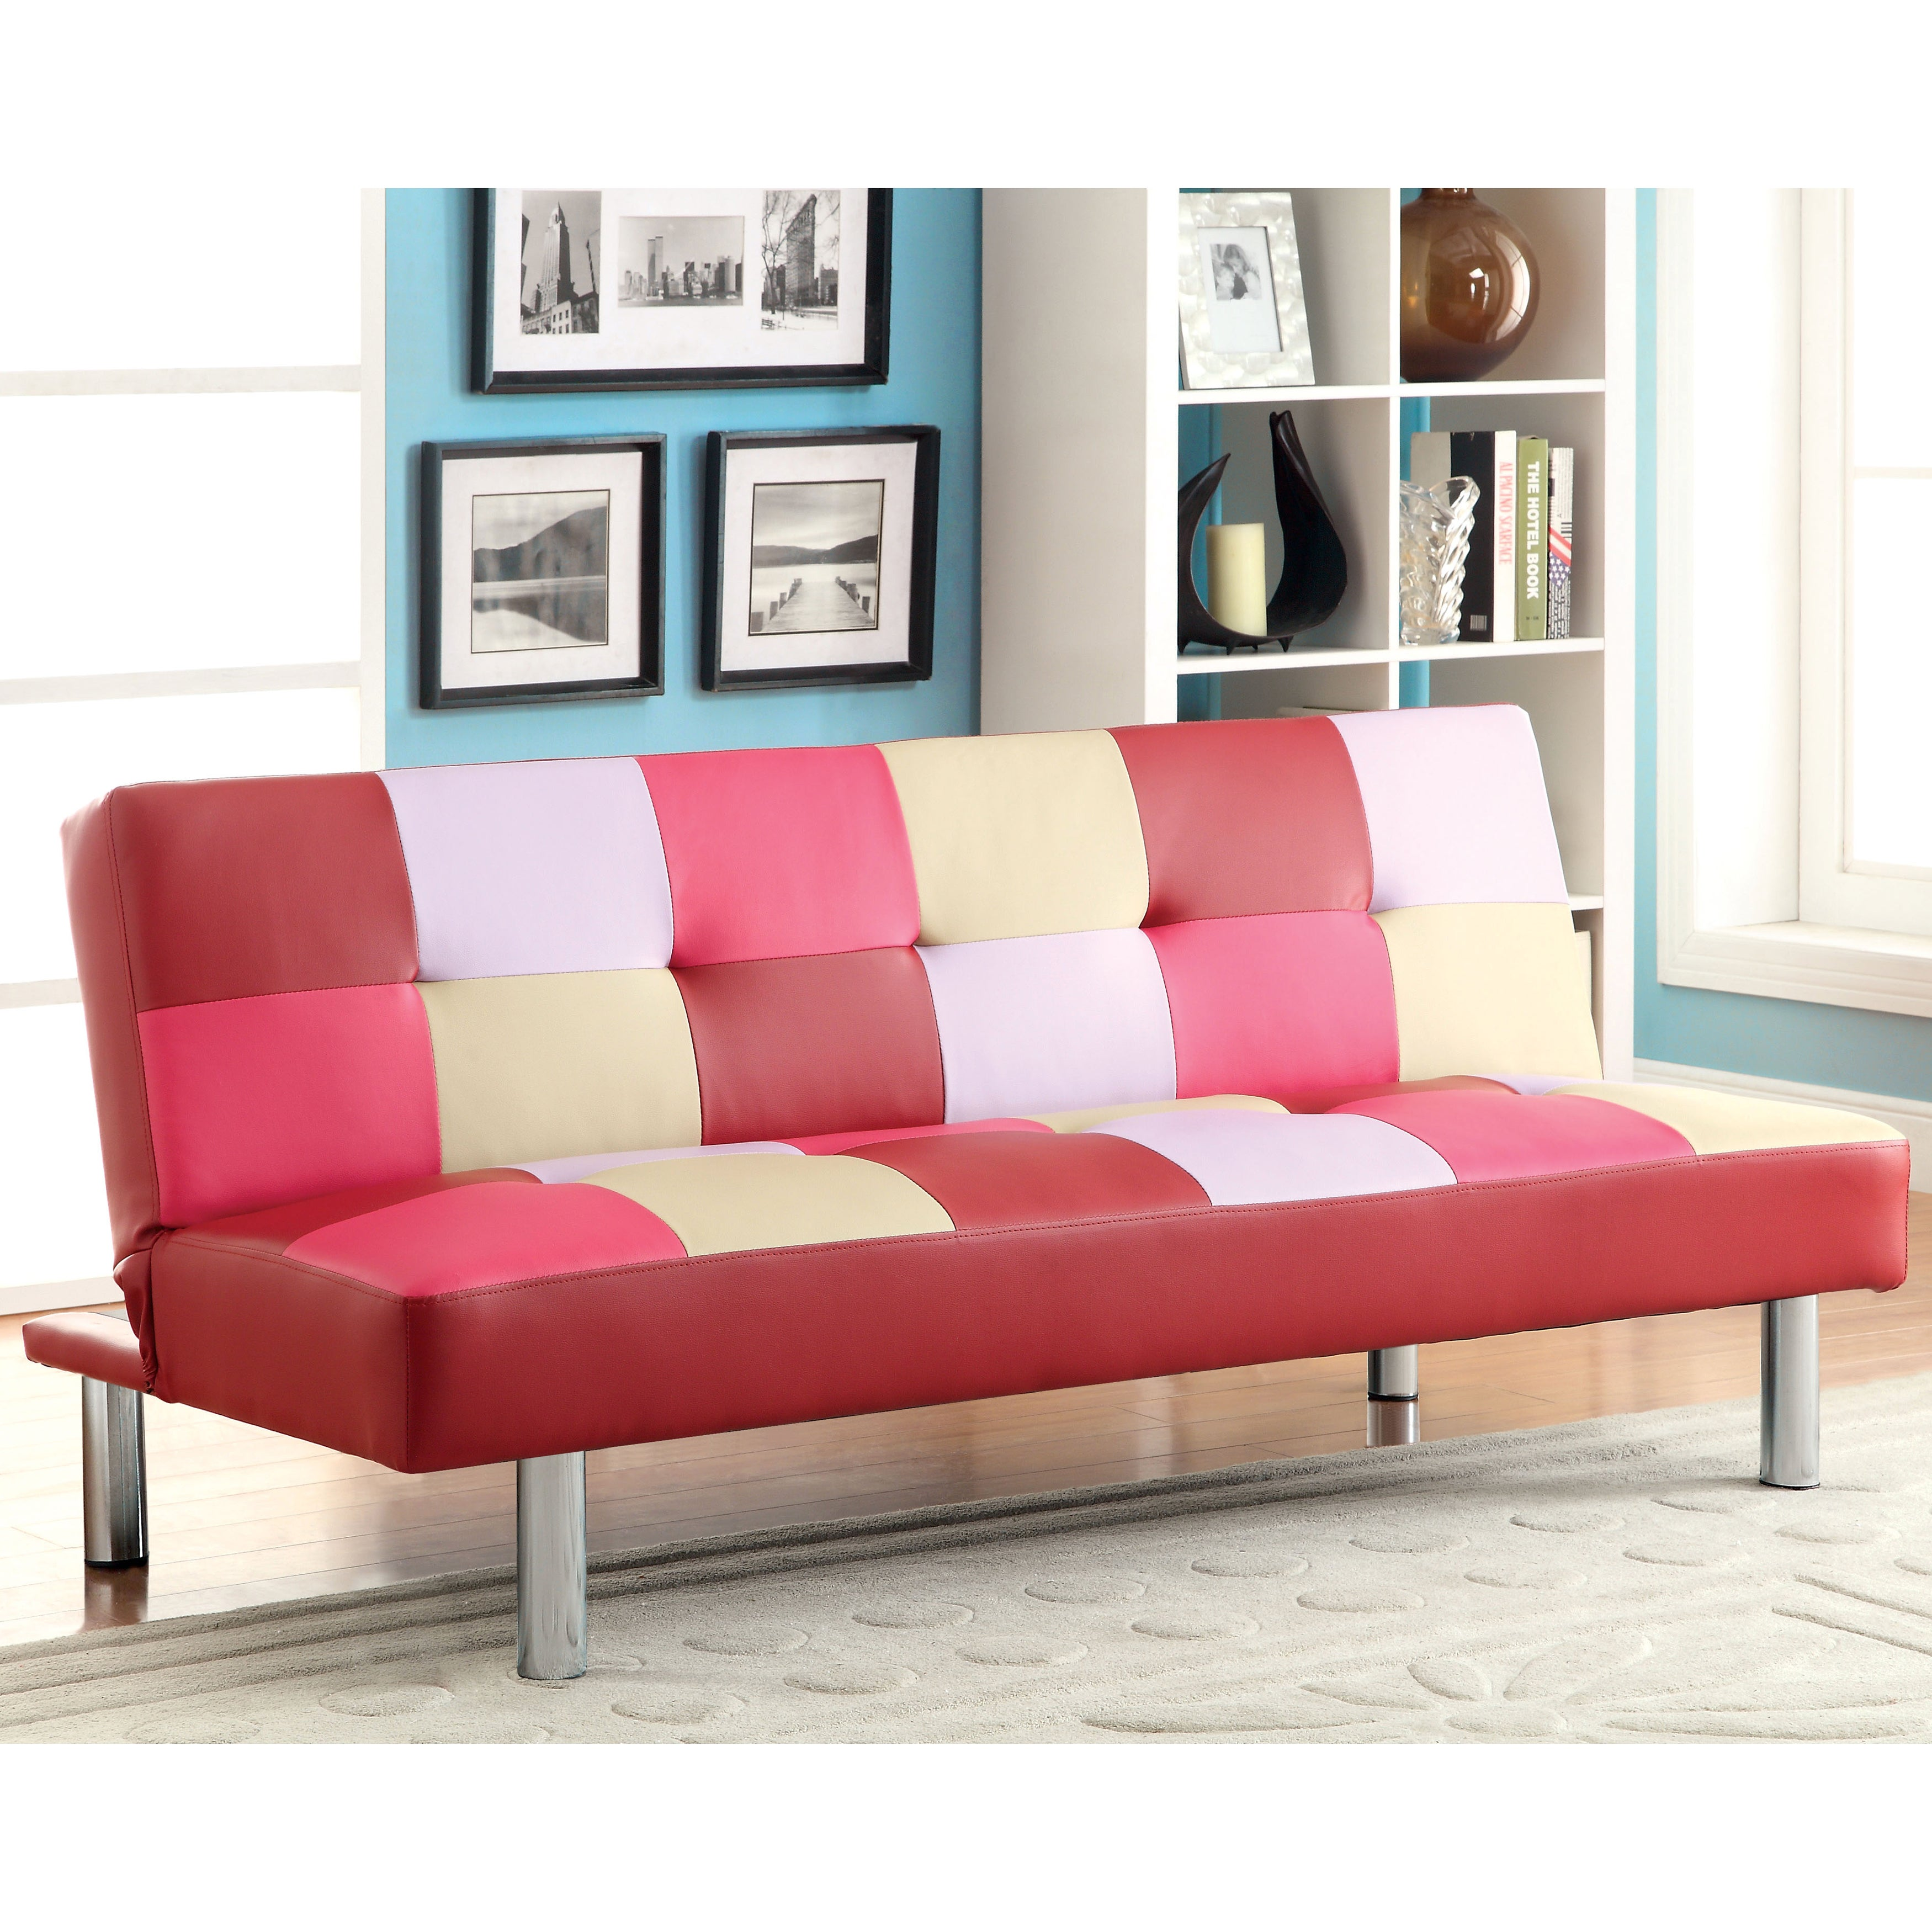 Pink Futon Sofa Sleeper